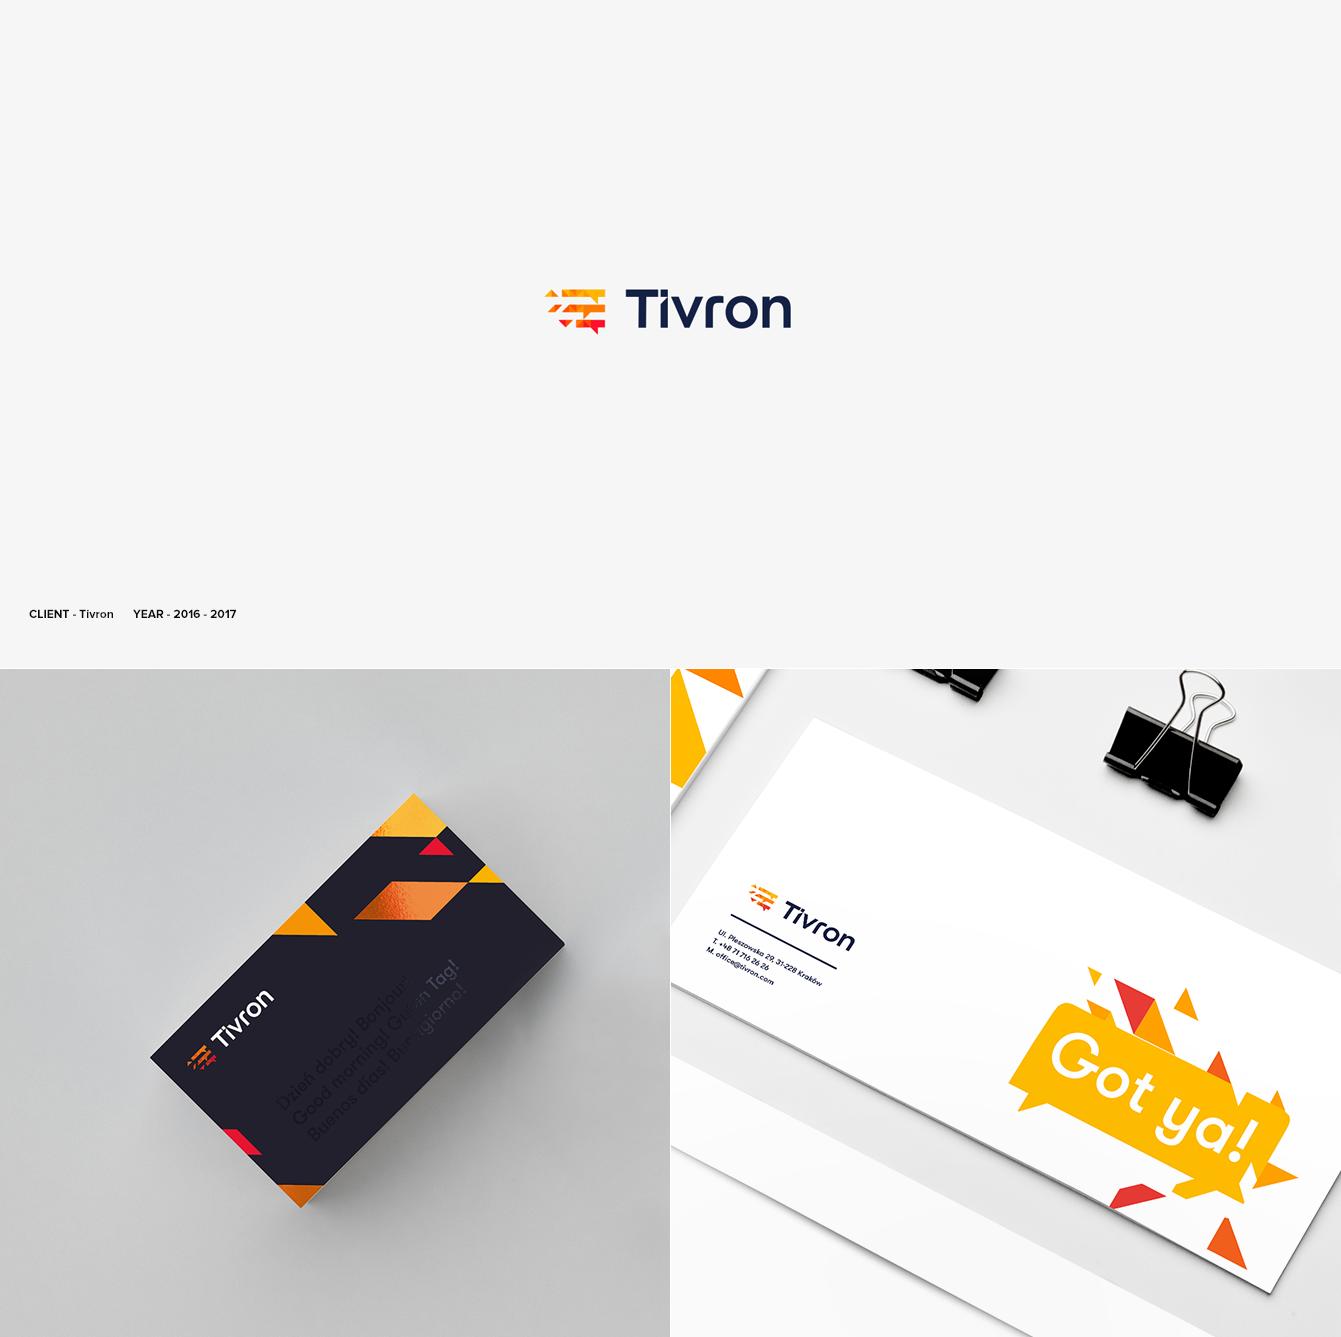 Branding & Graphic Design Works by CHALLENGE Studio